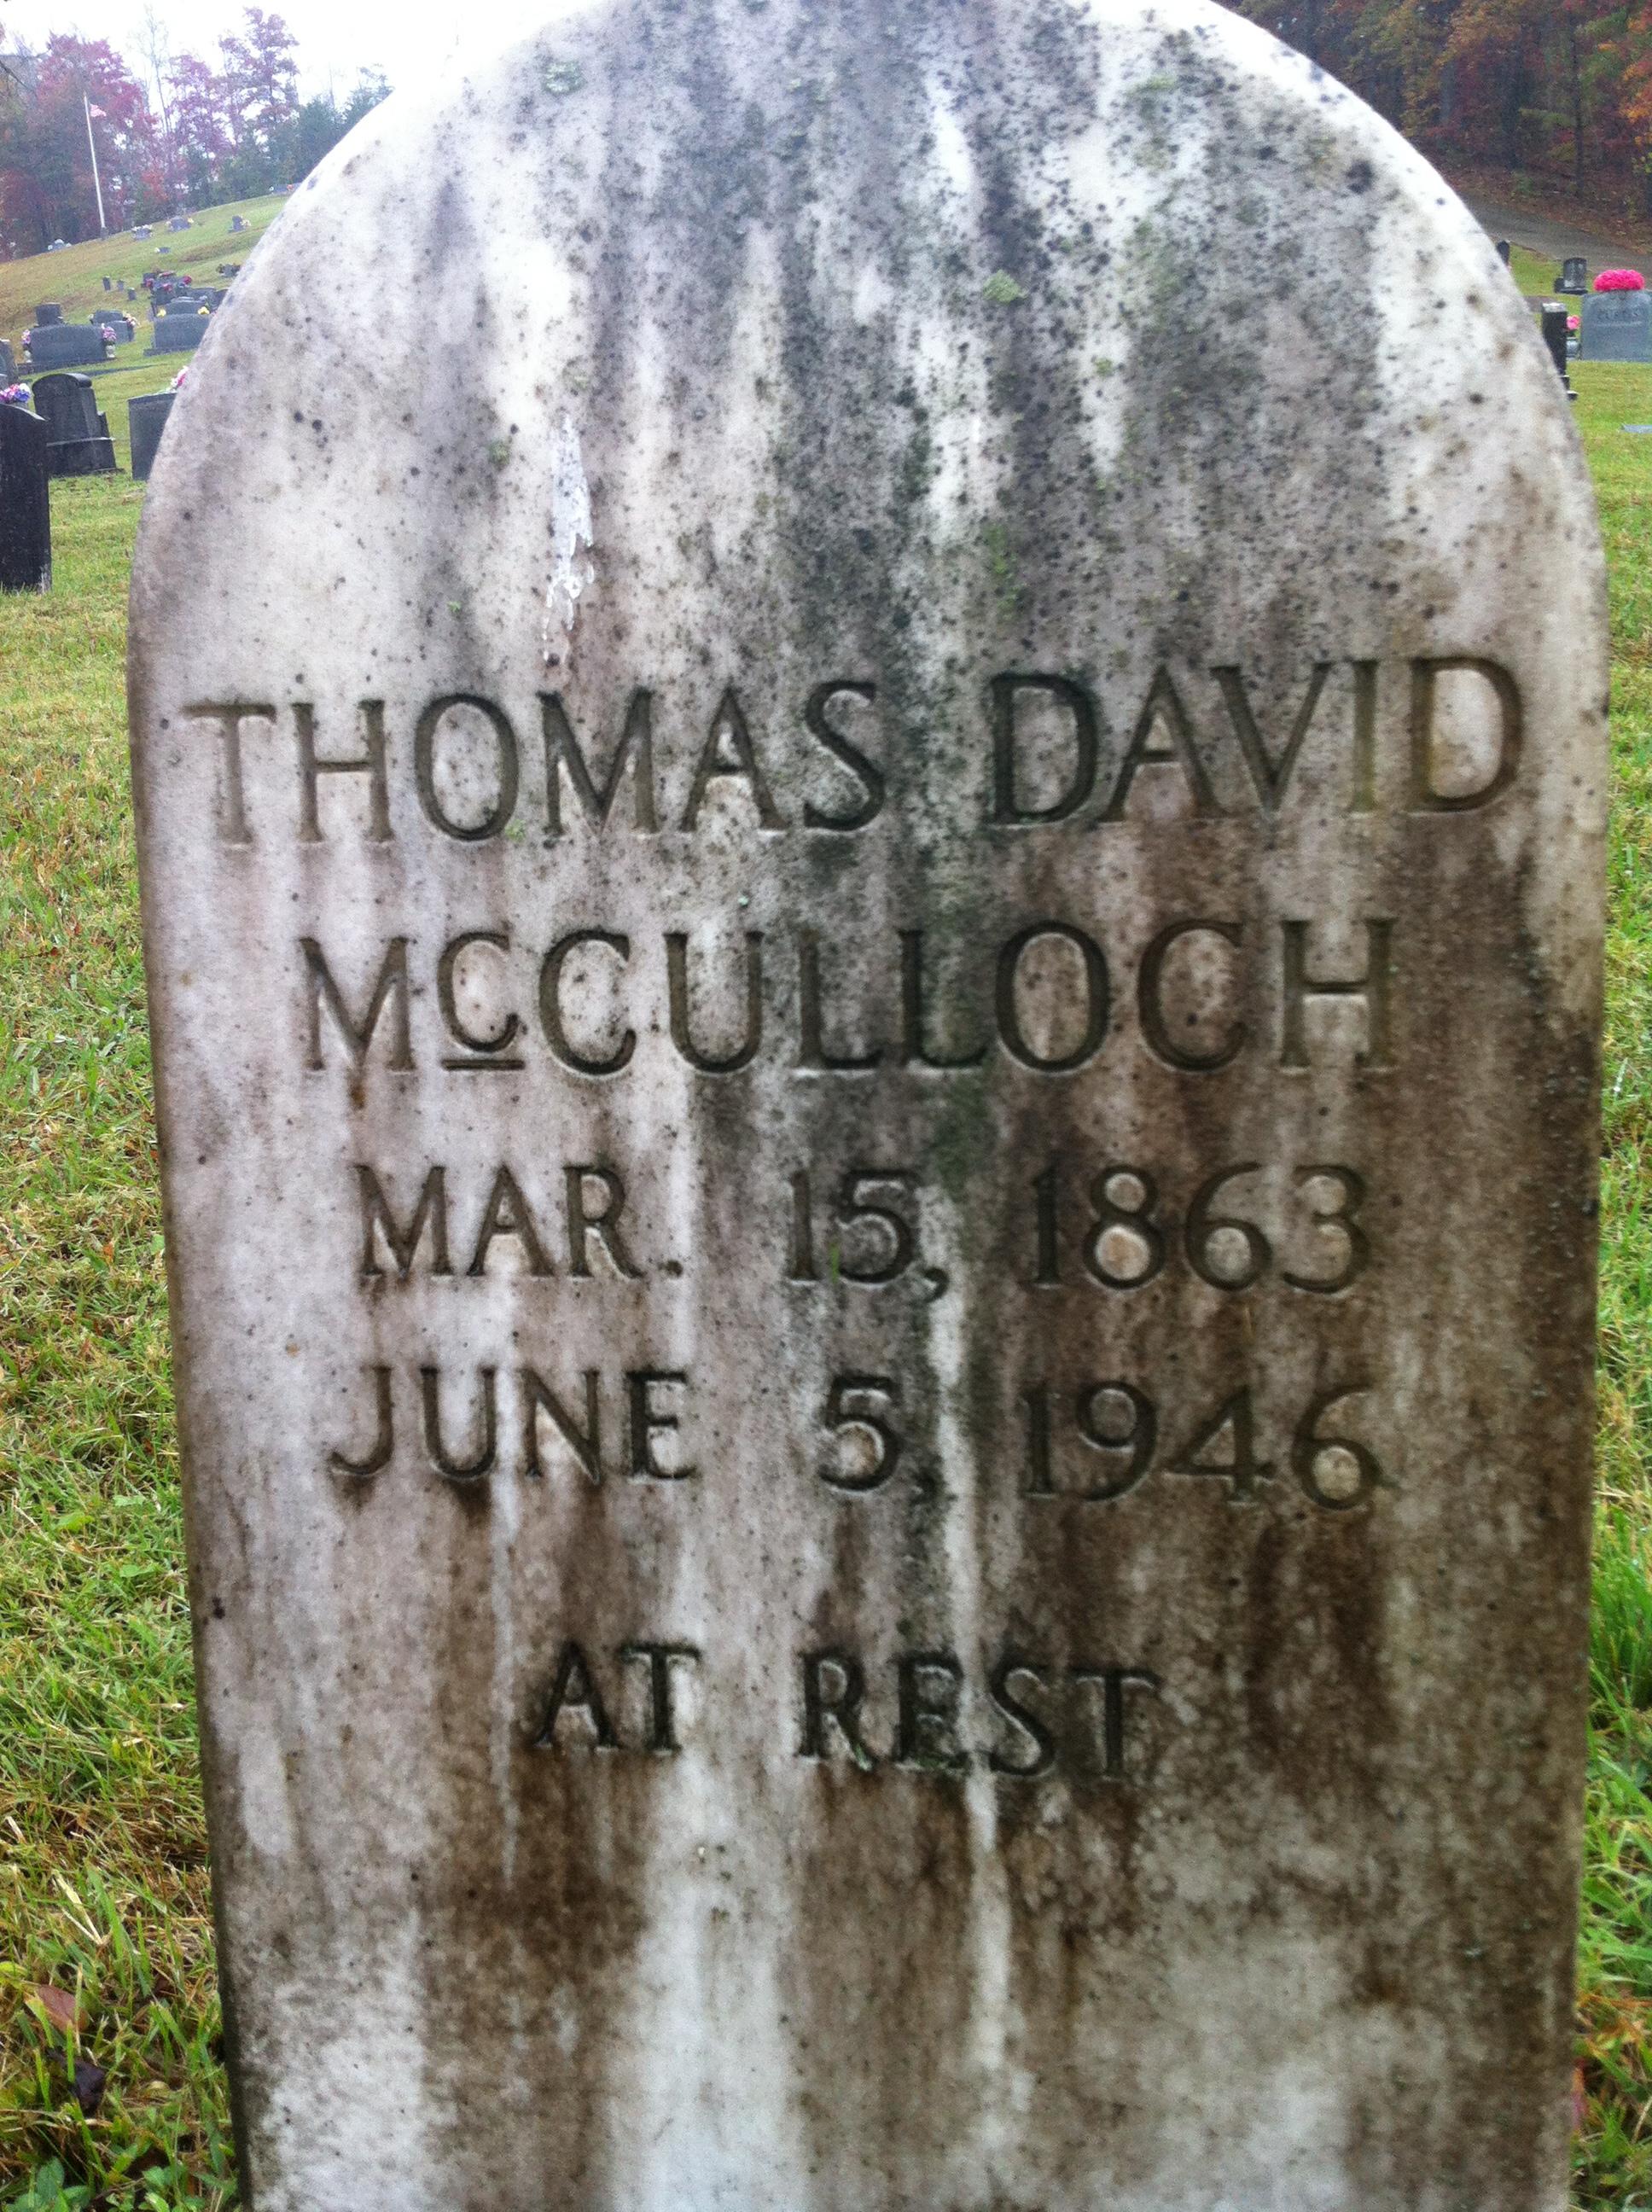 Thomas David Mcculloch